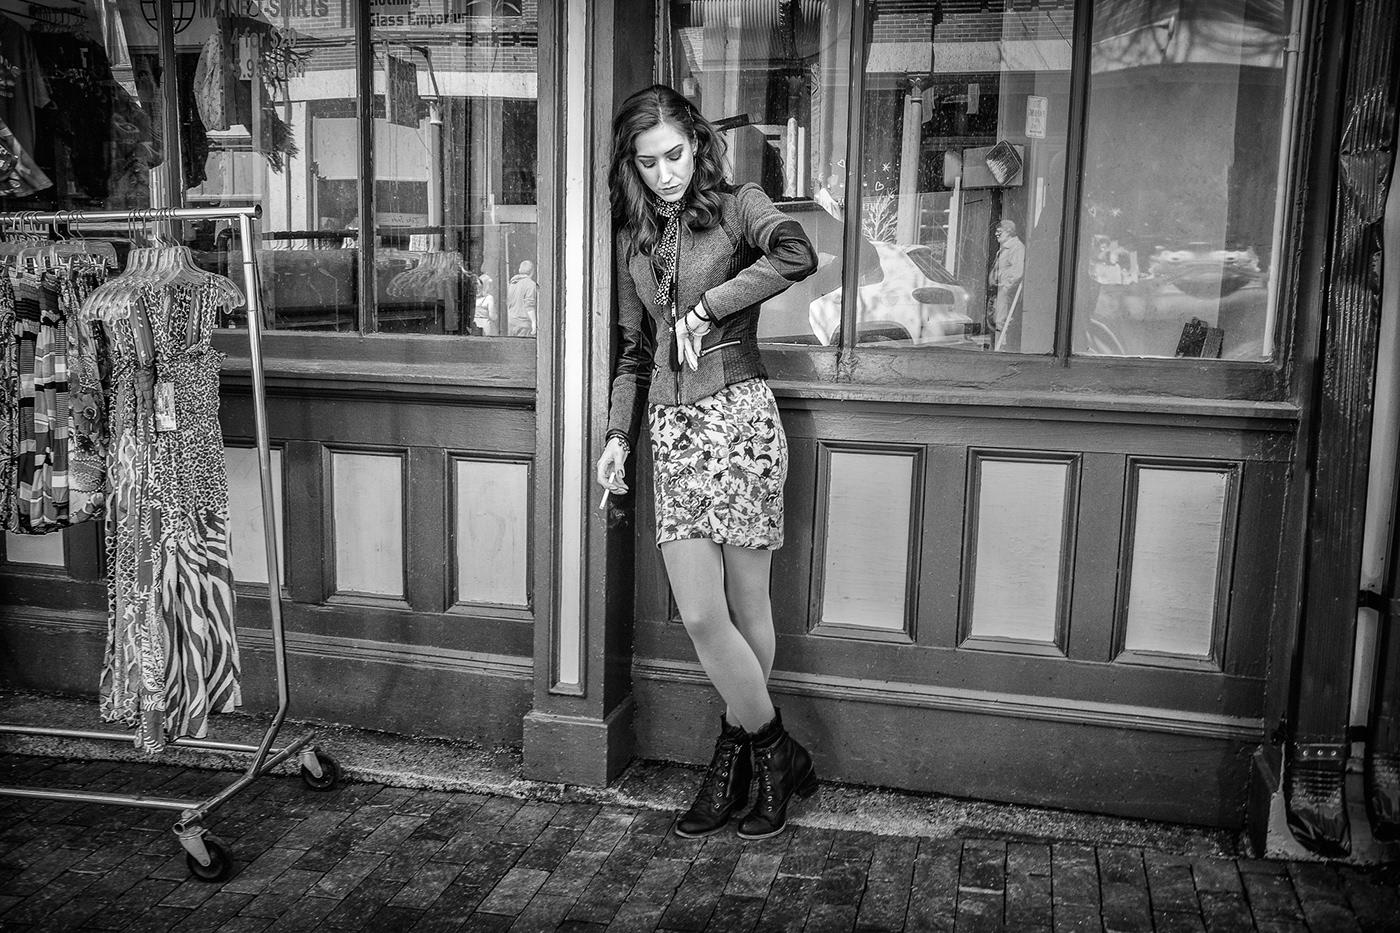 blackandwhite bw BW photography bwphotography editorial monochrome Photography  Street street photography streetphotography